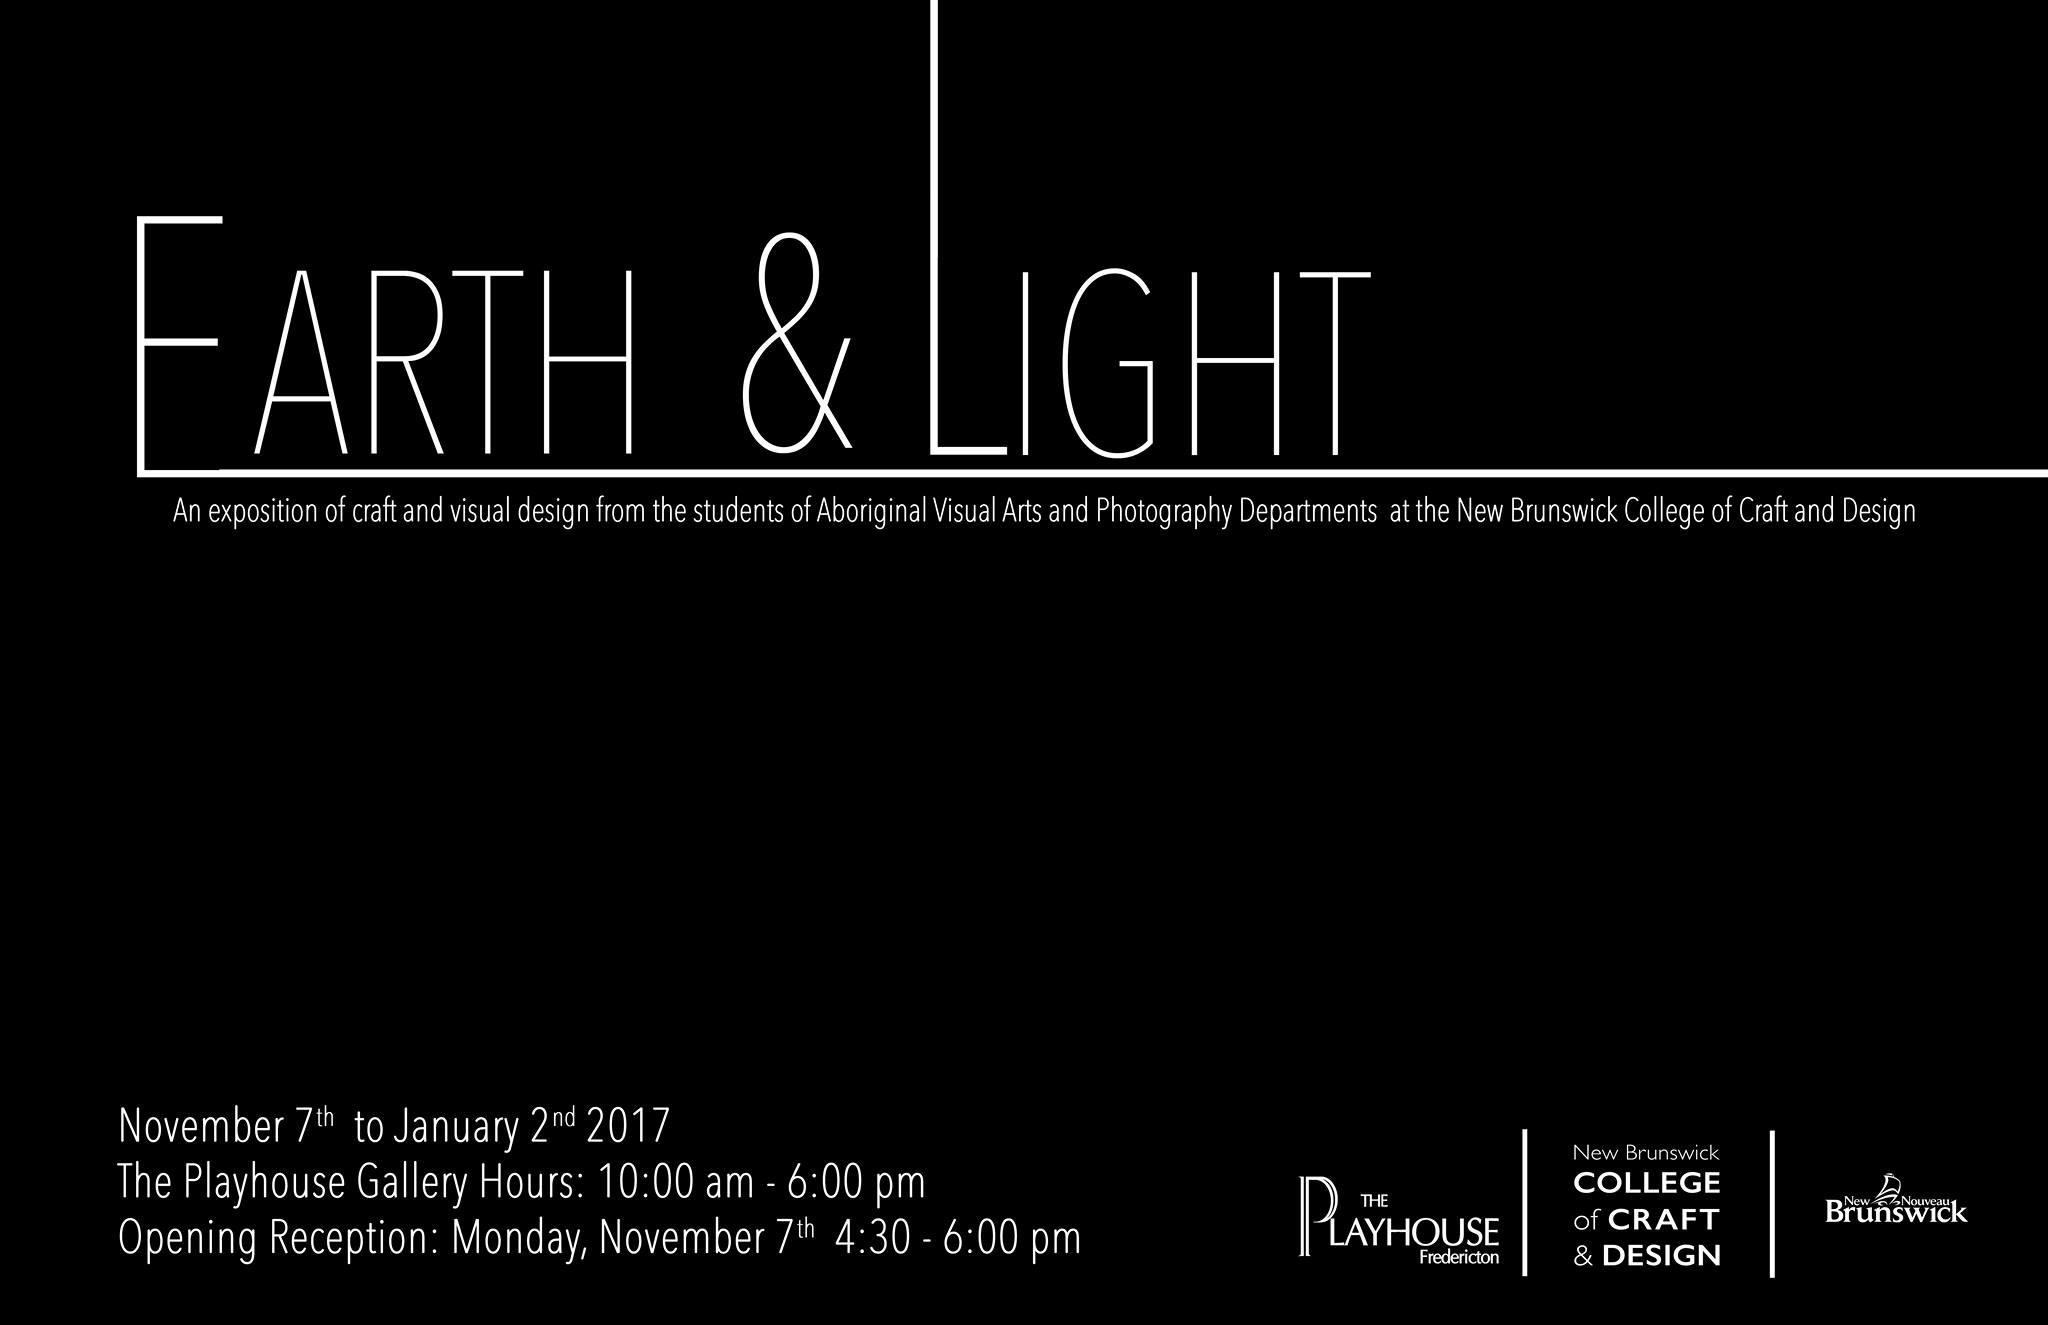 Earth & Light  Fredericton Playhouse Gallery November 2016